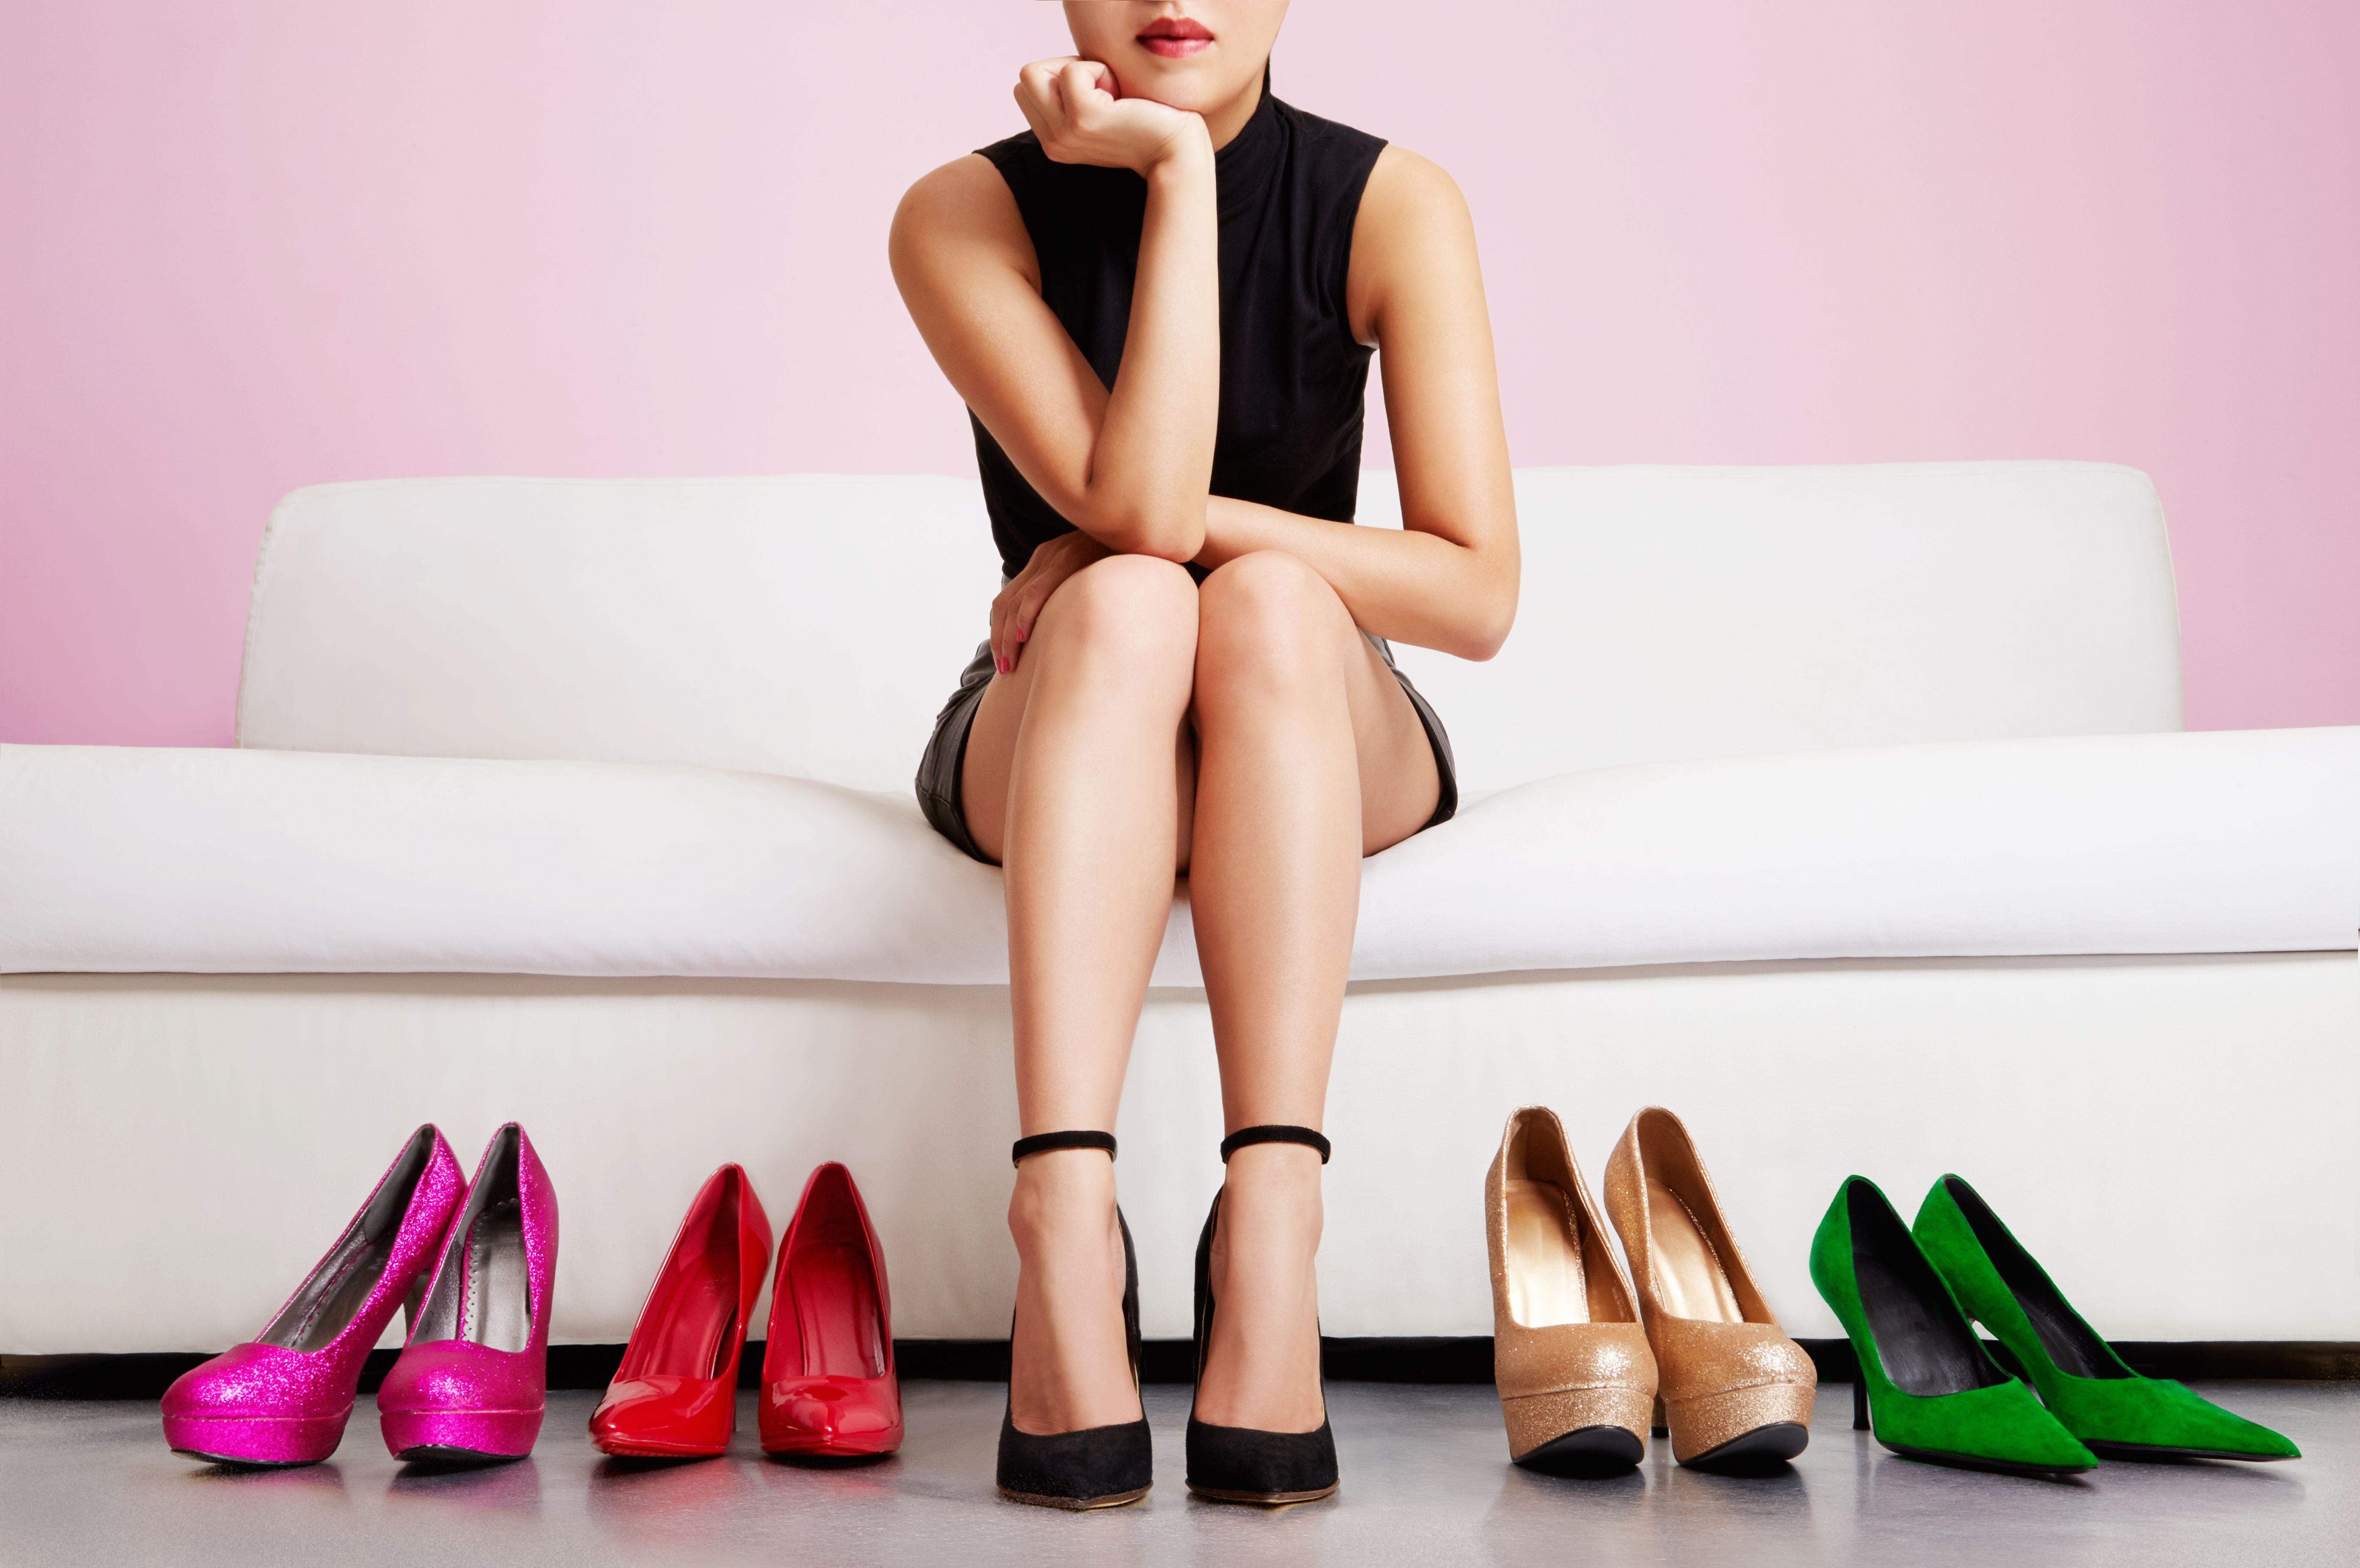 303241c98a6 Κιρσοί: Πόσο φταίνε τα παπούτσια με ψηλά τακούνια;